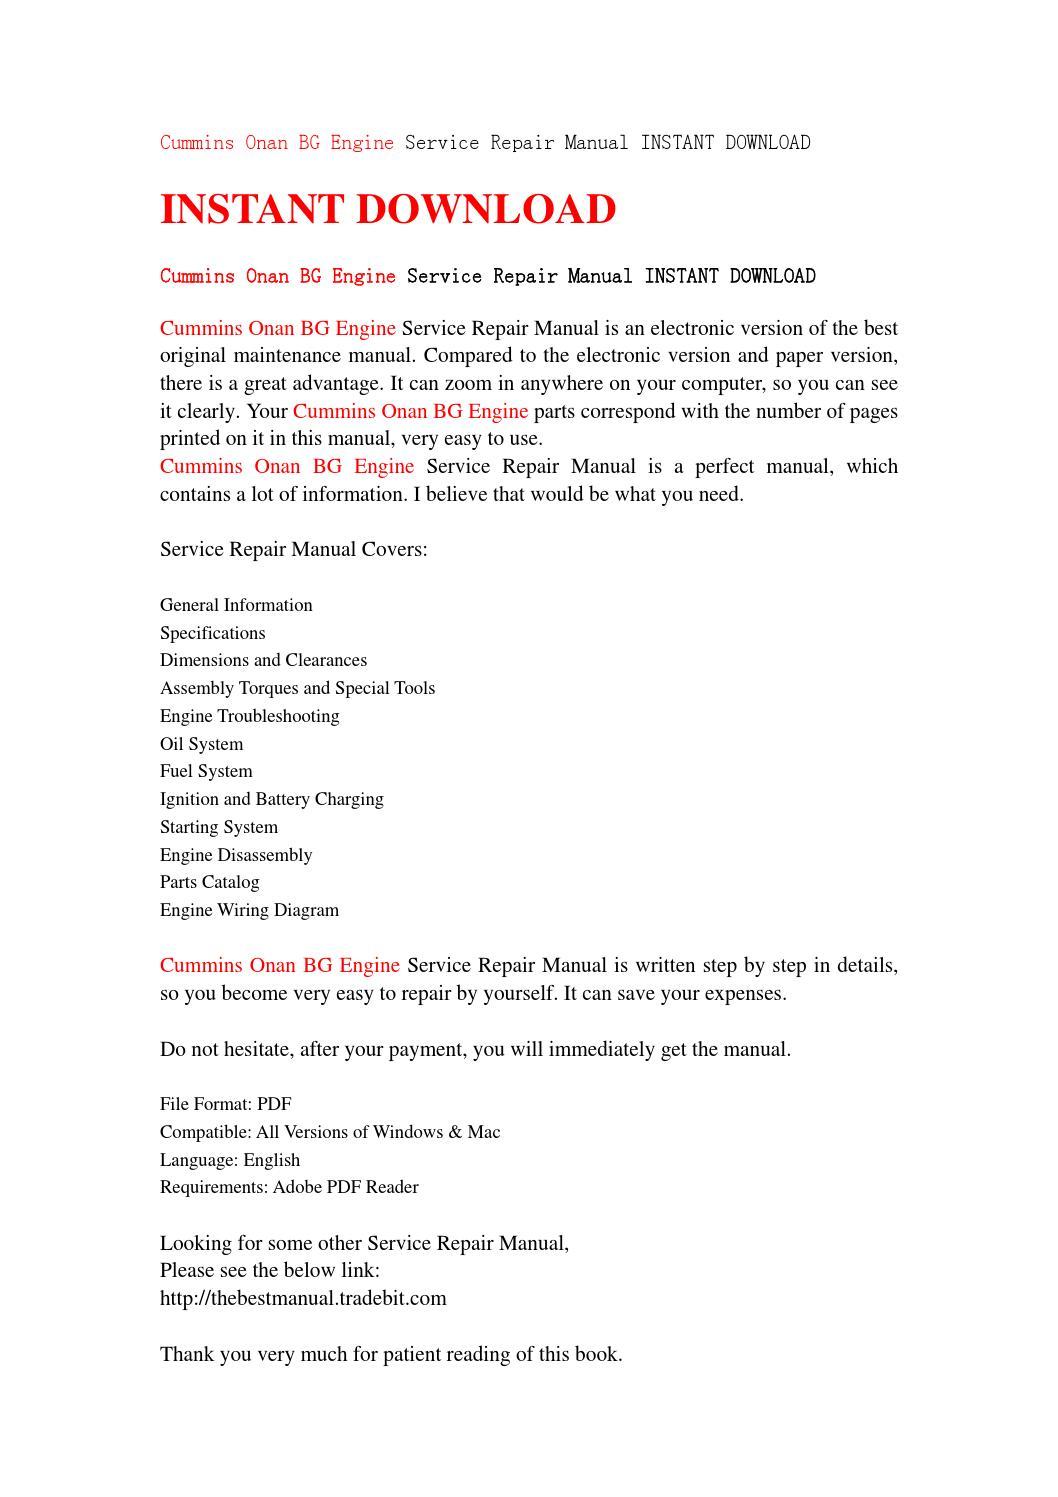 Cummins onan bg engine service repair manual instant download by jhsefjn7 -  issuu